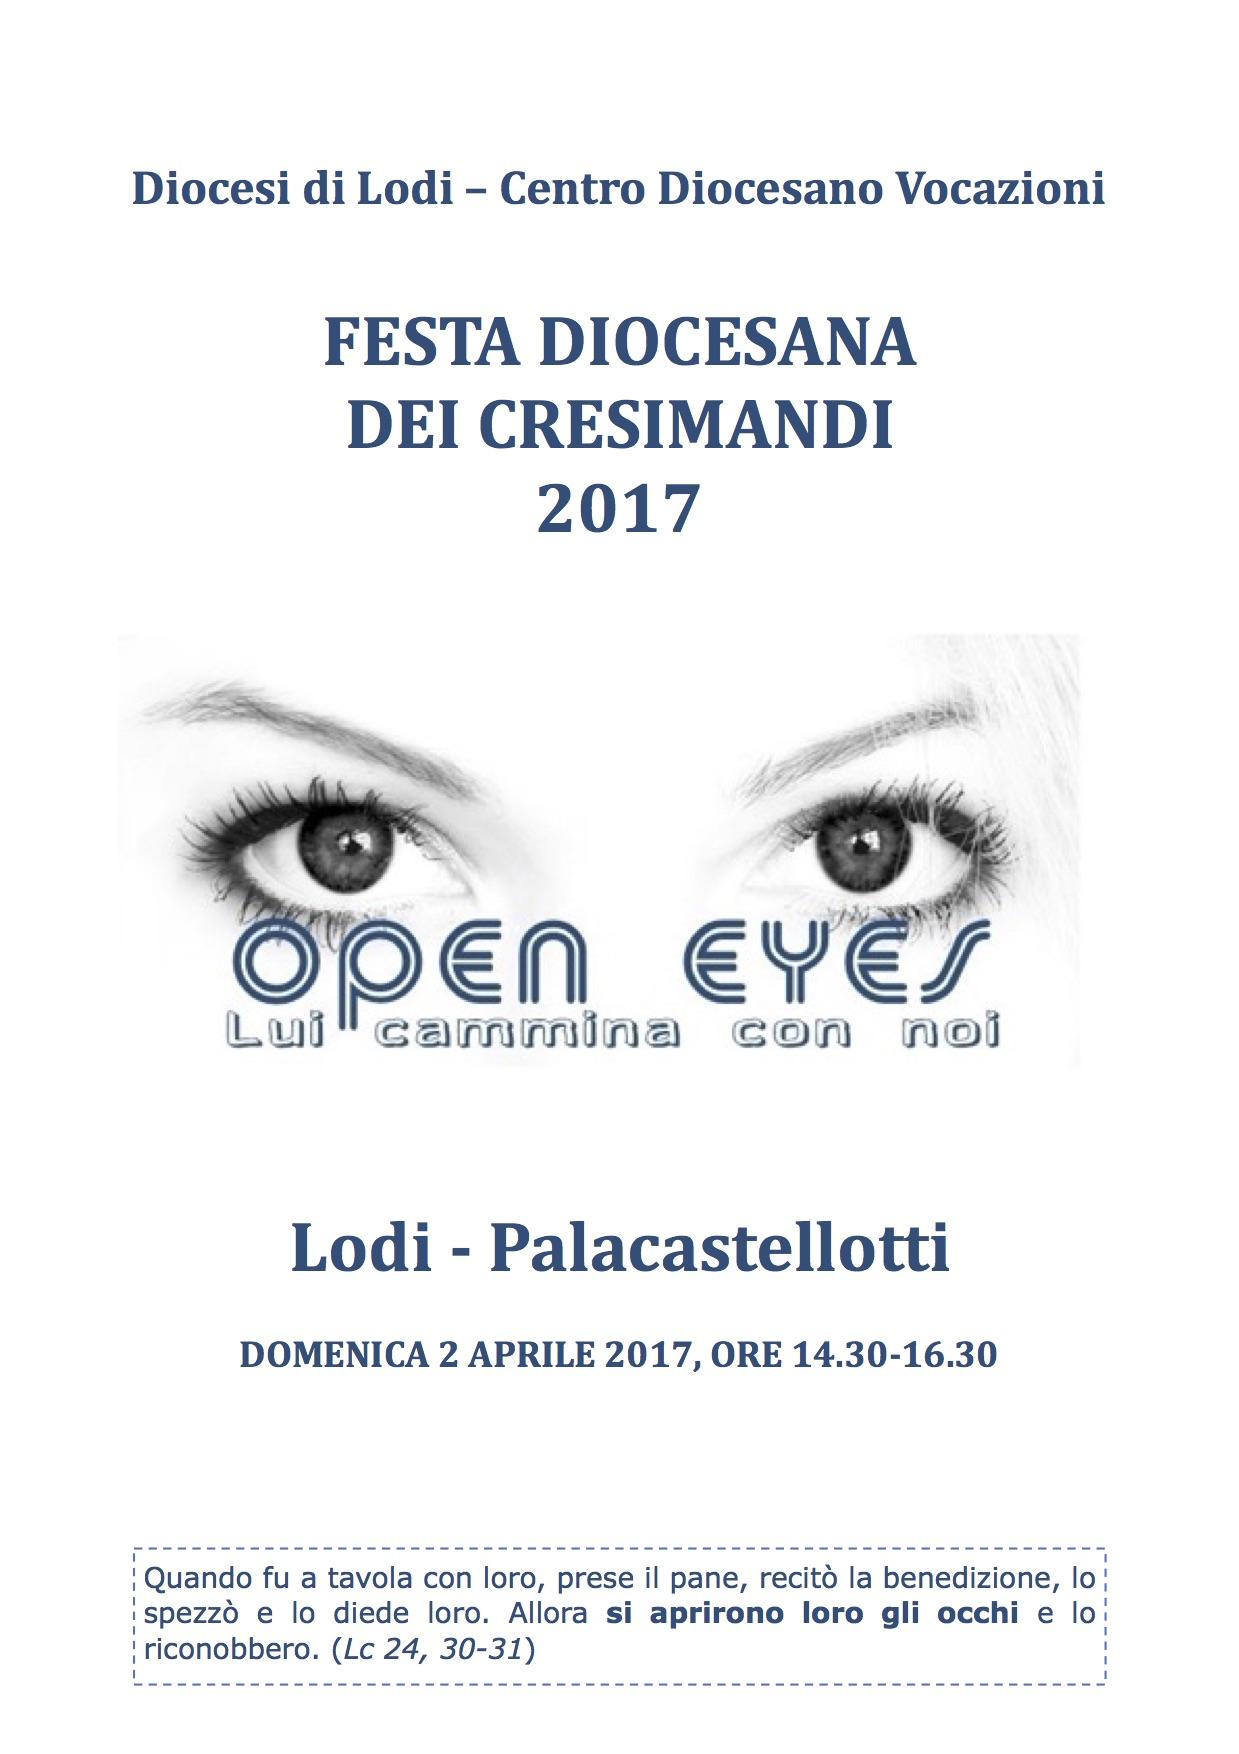 Festa Diocesana Cresimandi